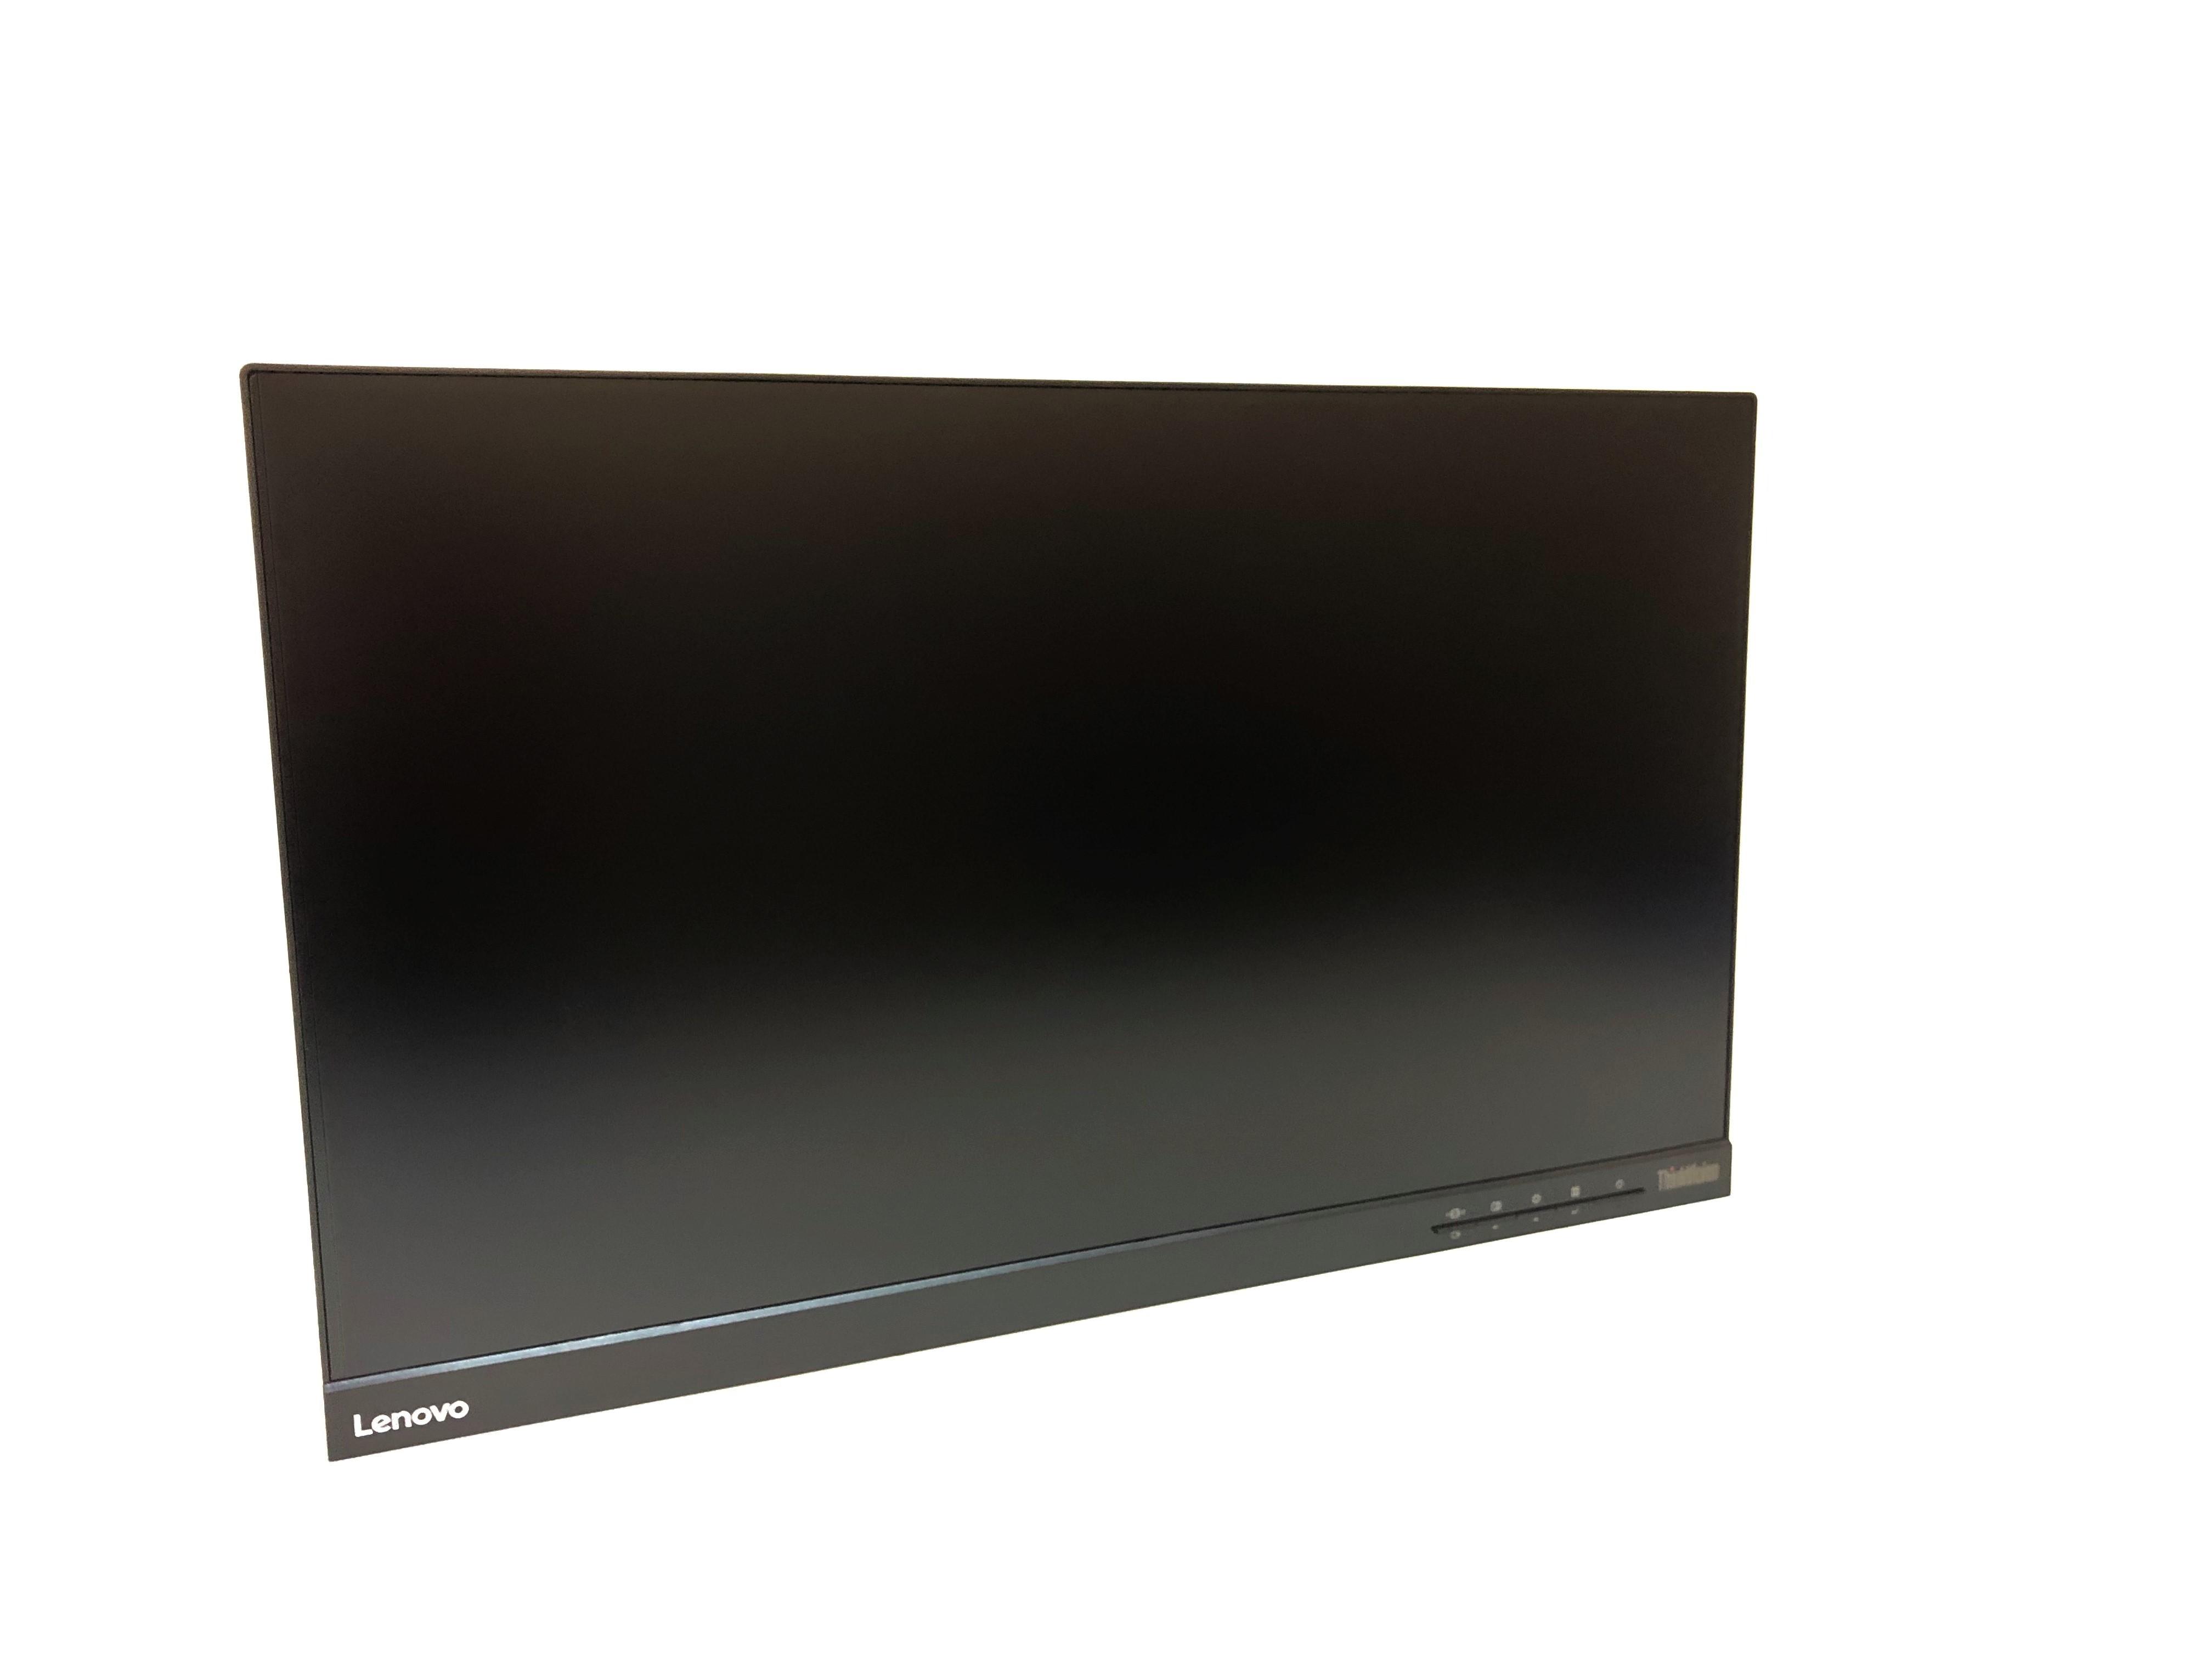 Lenovo ThinkVision T23i-10 No 2